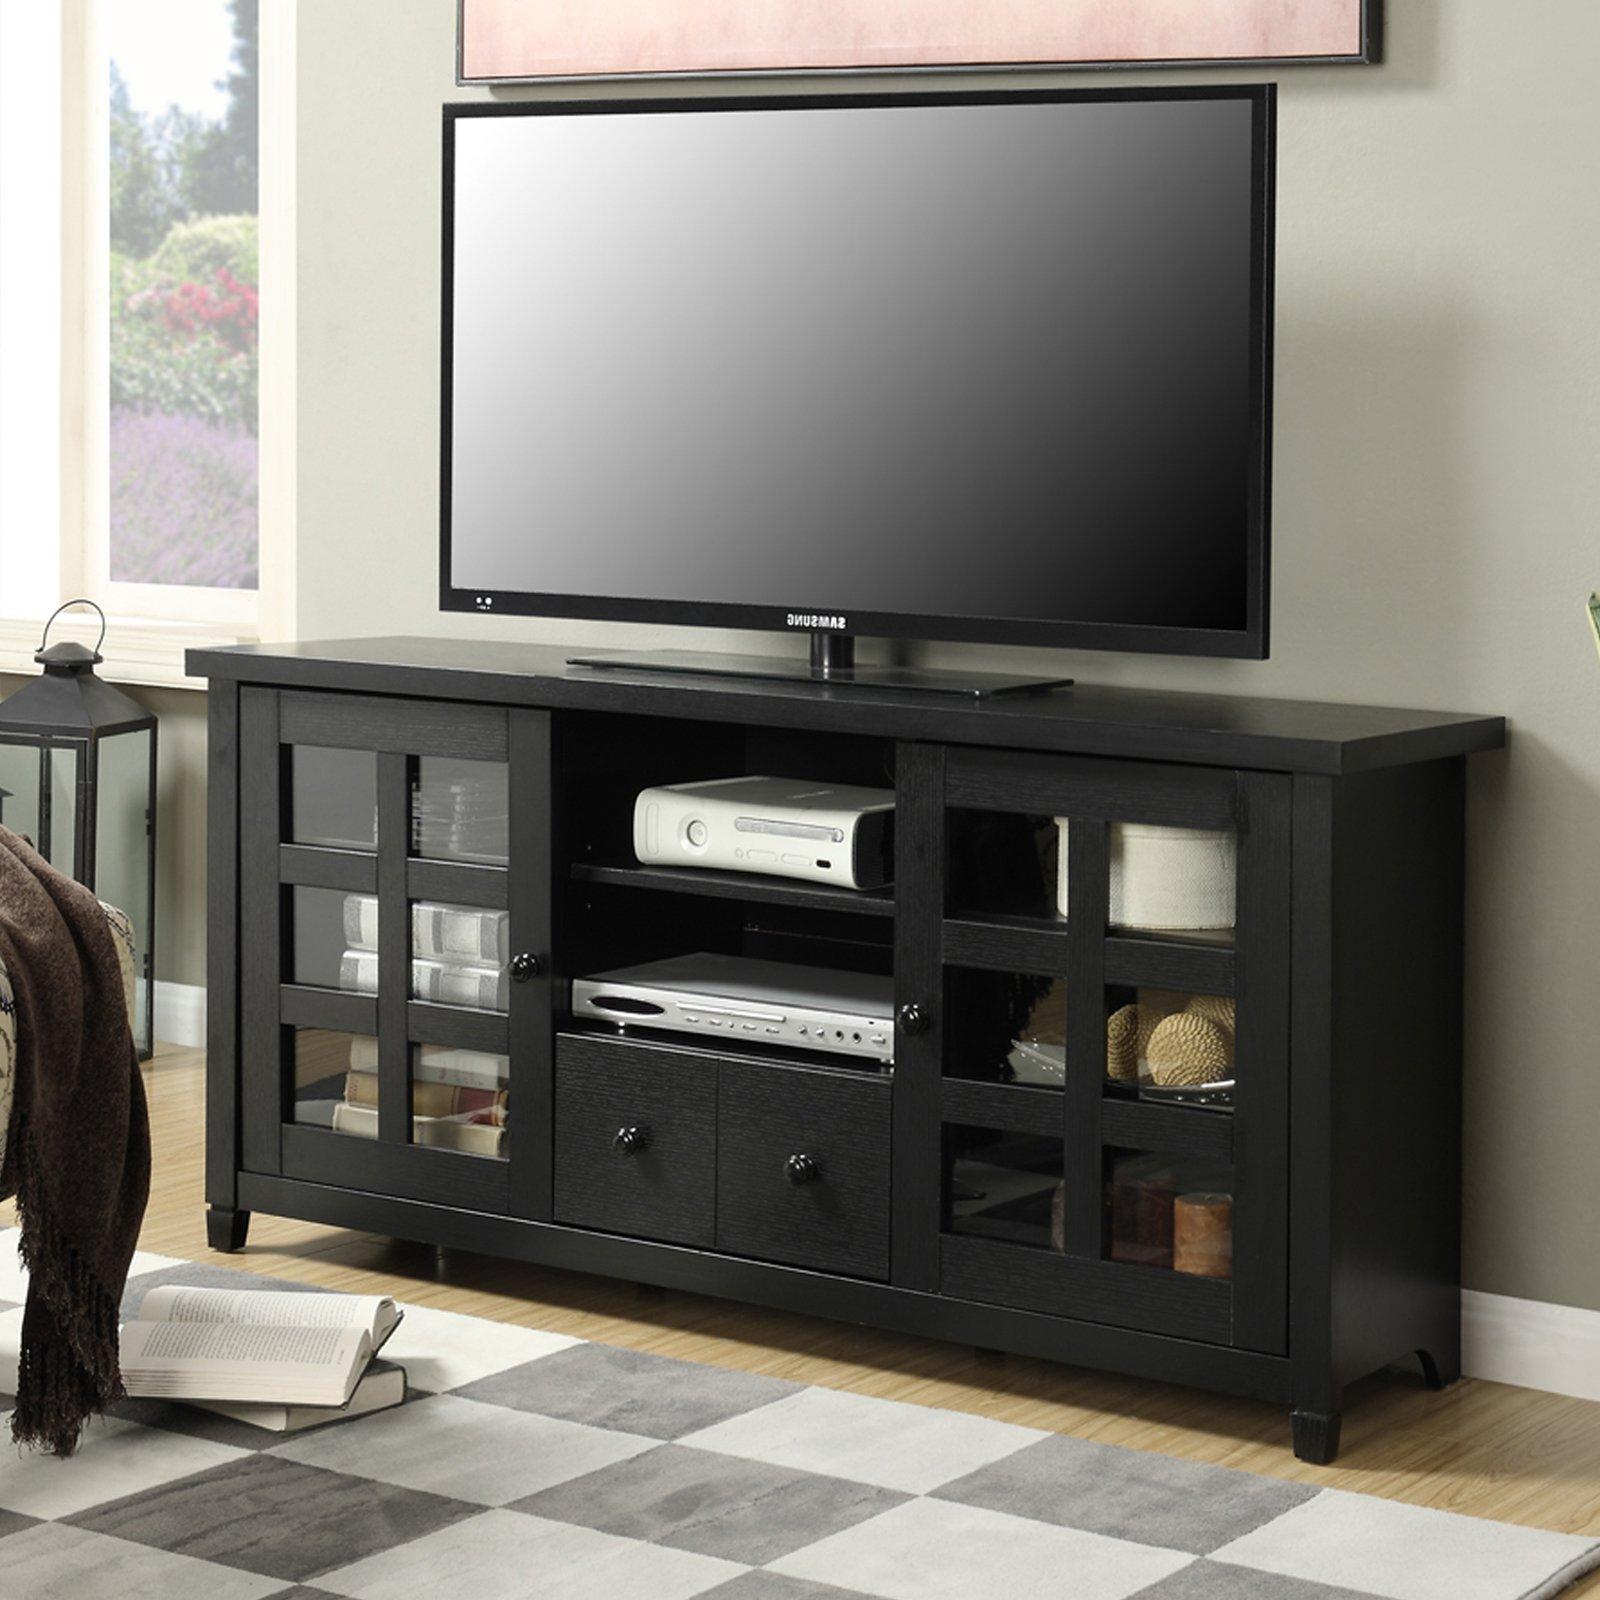 Tv Stands & Entertainment Centers | Hayneedle Regarding Laurent 70 Inch Tv Stands (View 8 of 20)